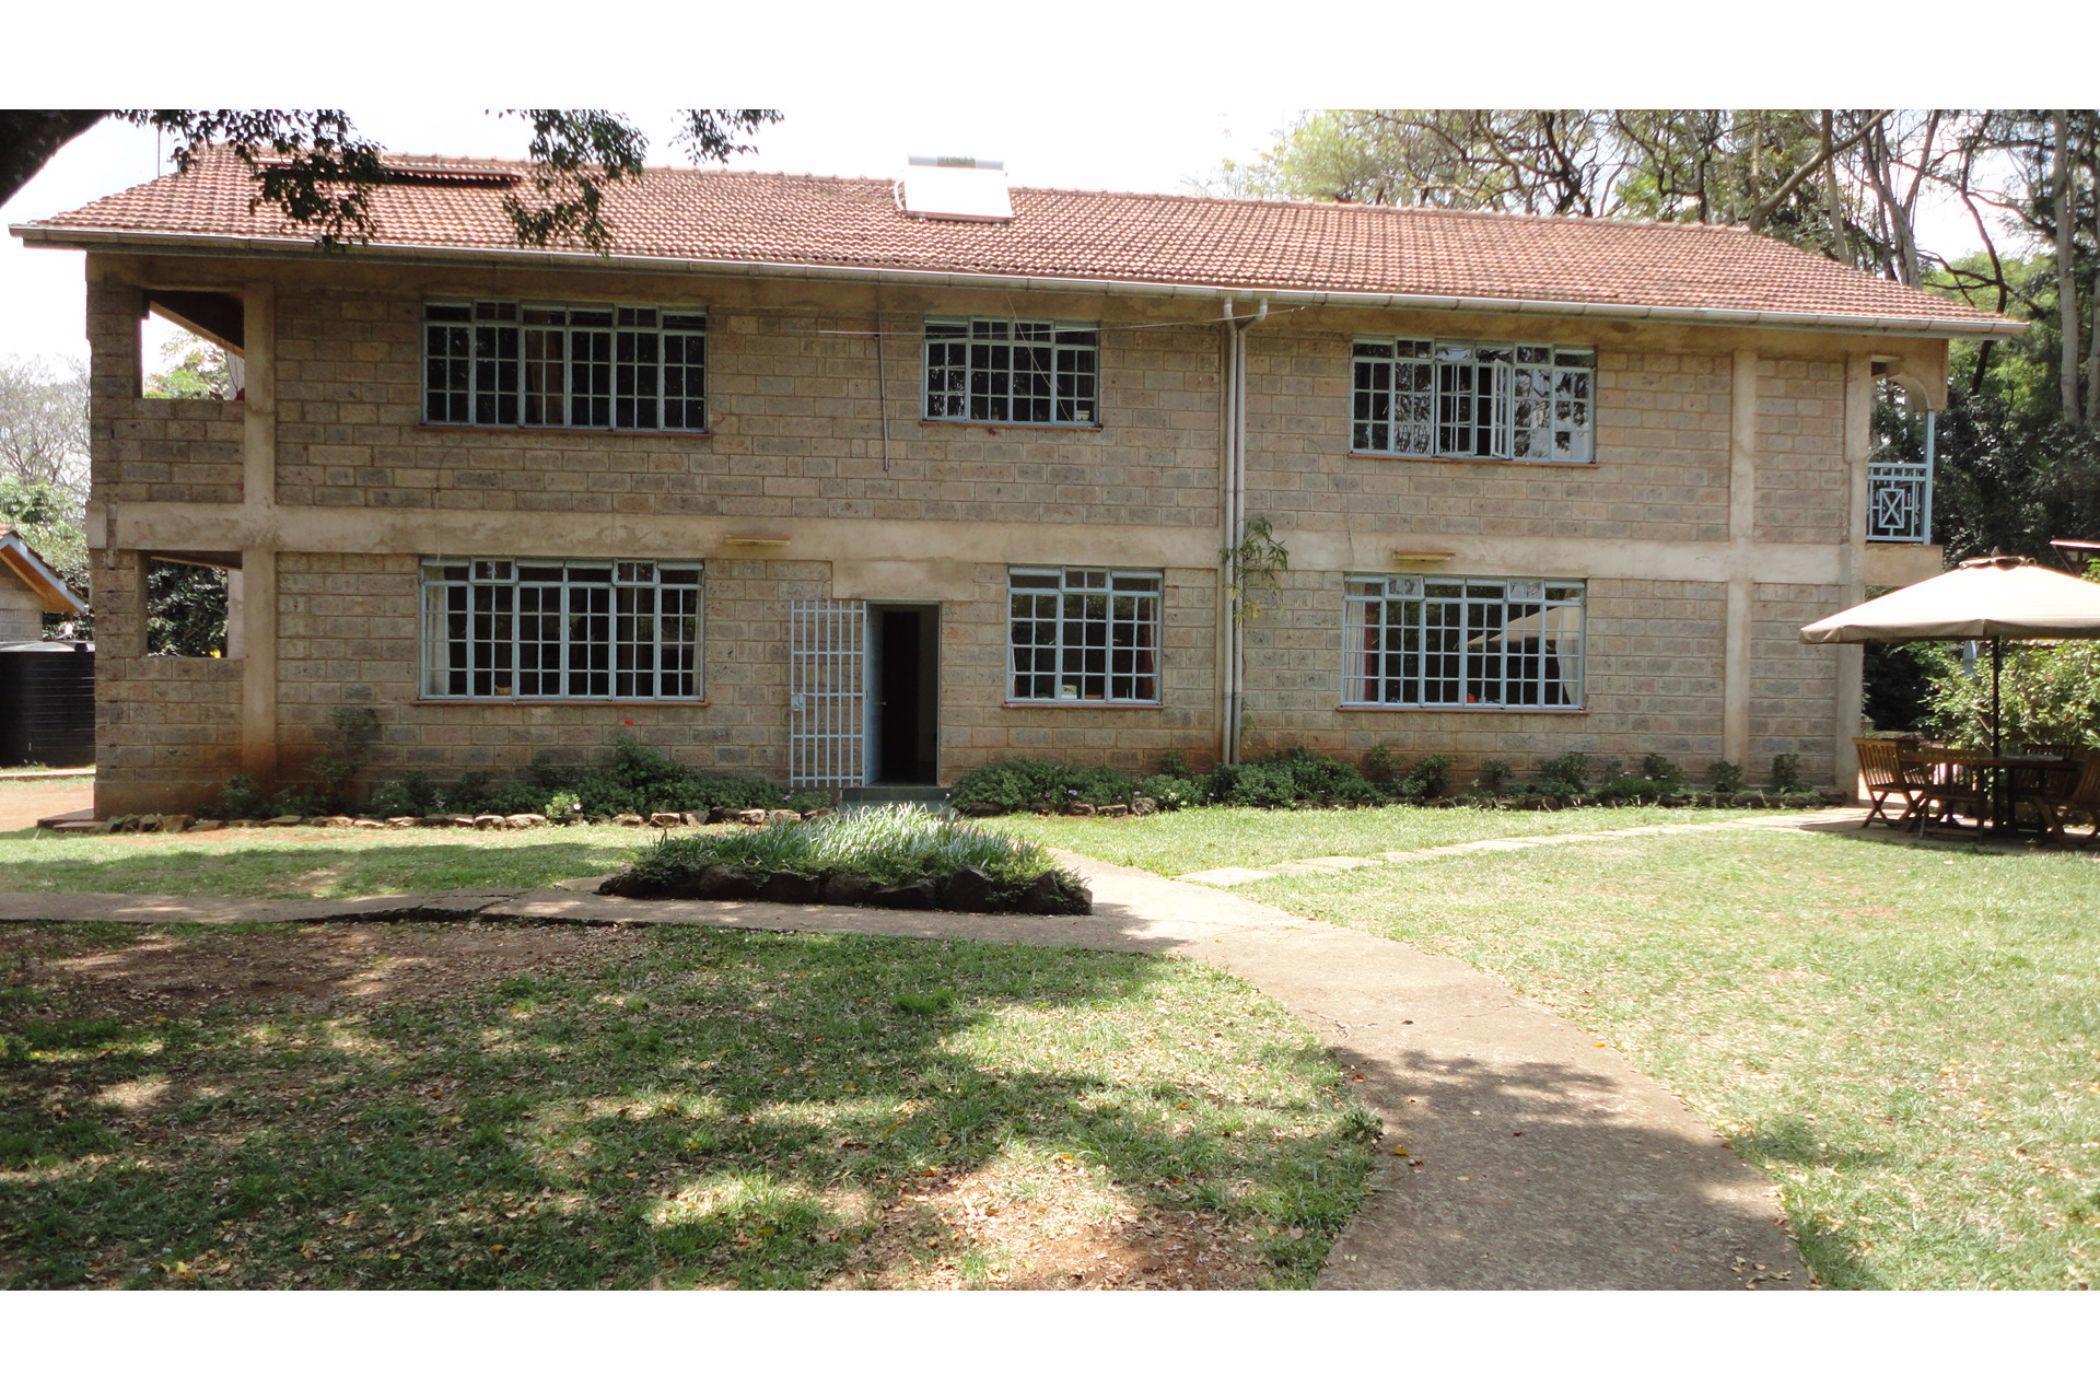 0.8 acres vacant land for sale in Lavington (Kenya)